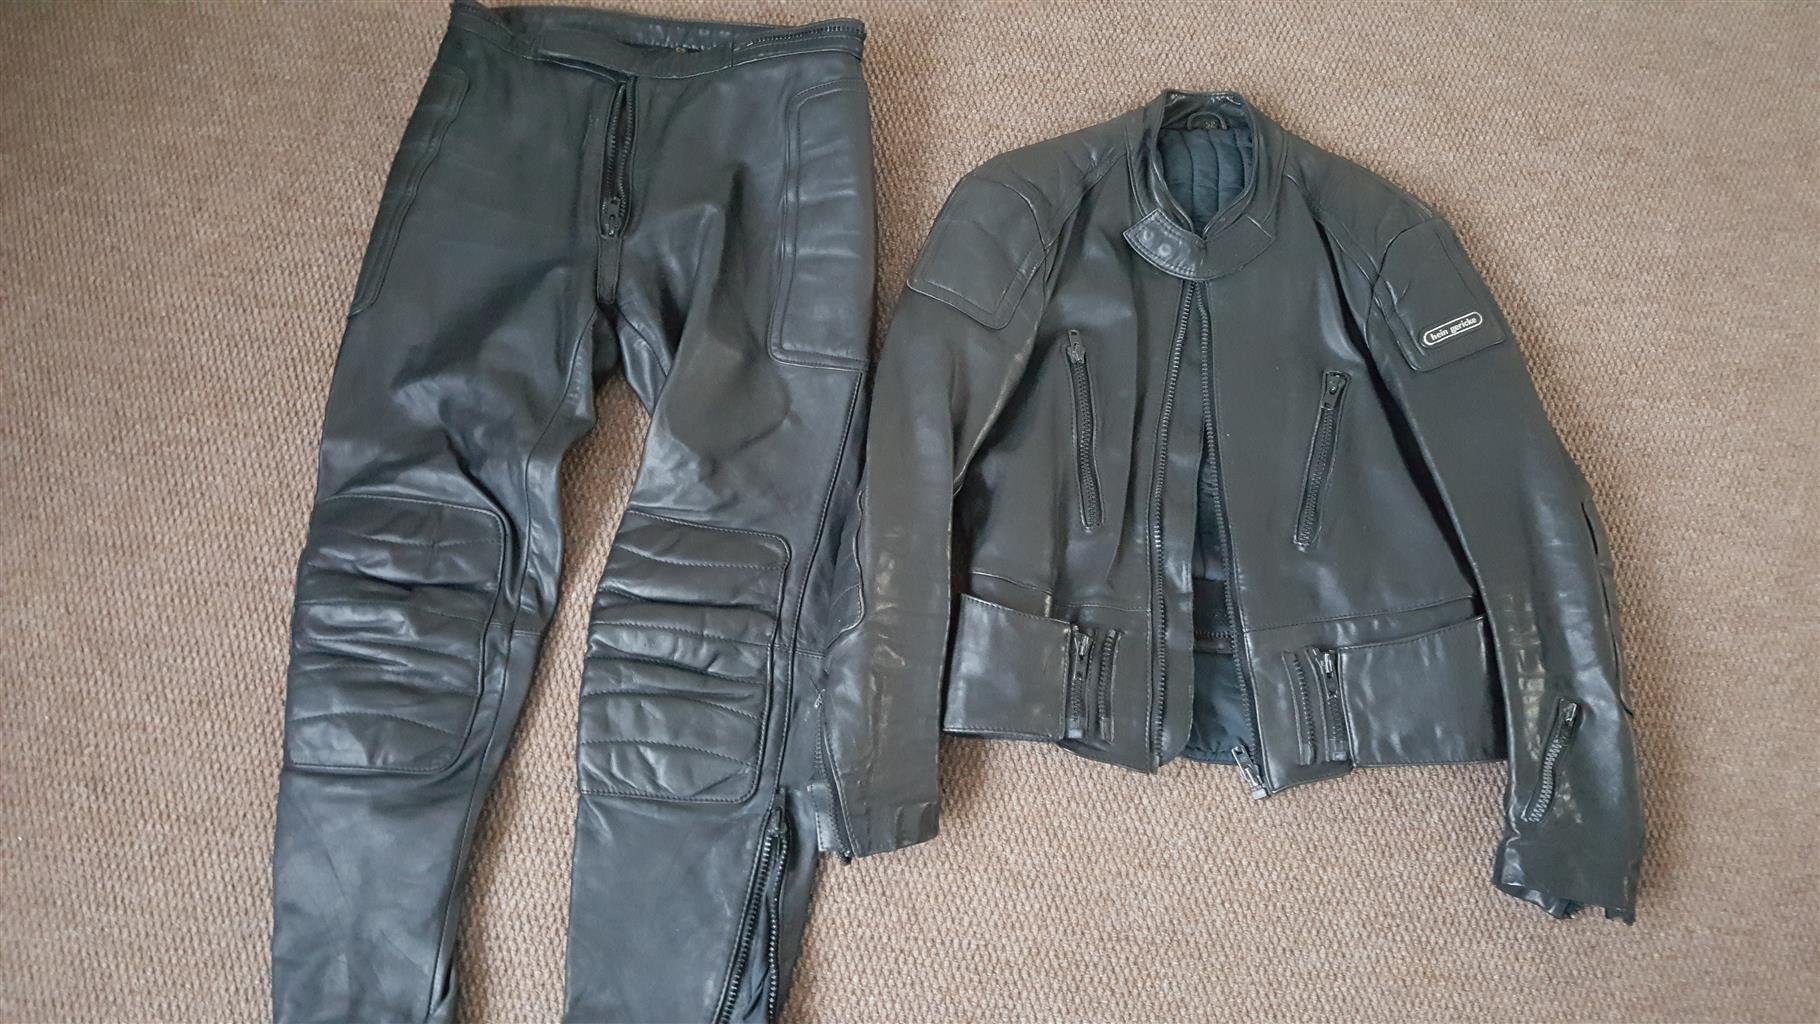 Leather jacket and pants set